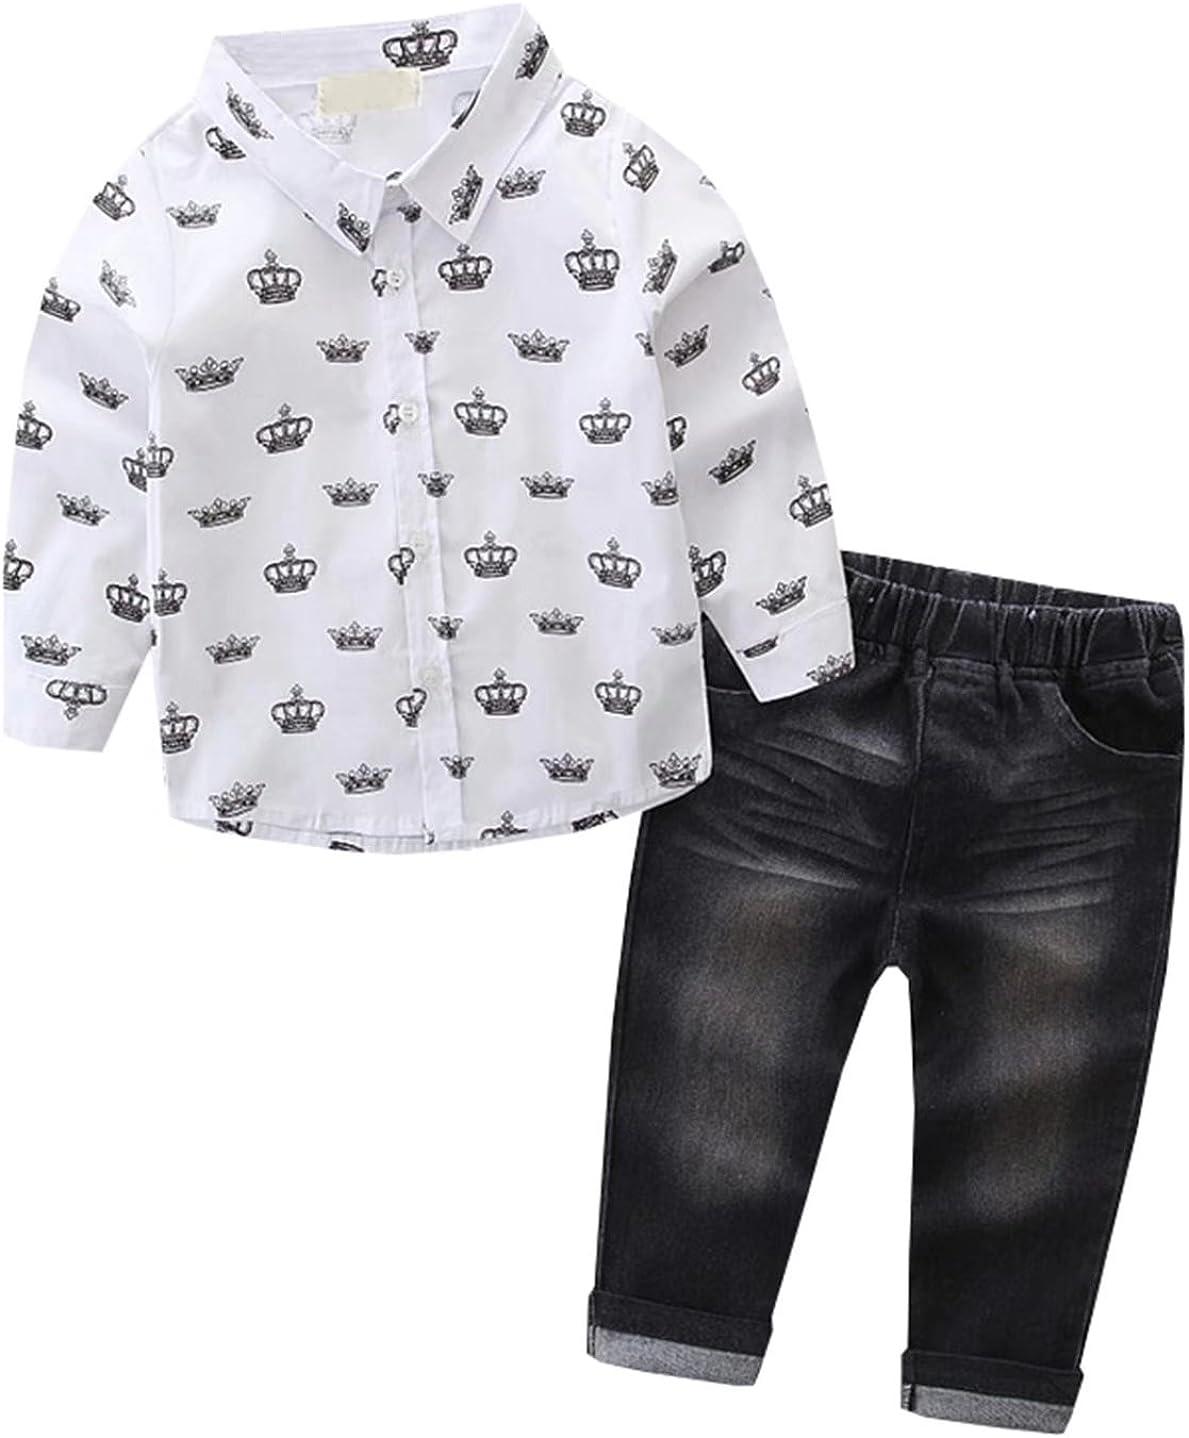 Ameyda Boys Long Sleeves Tops Crown T-Shirt + Jeans 2 Piece Set